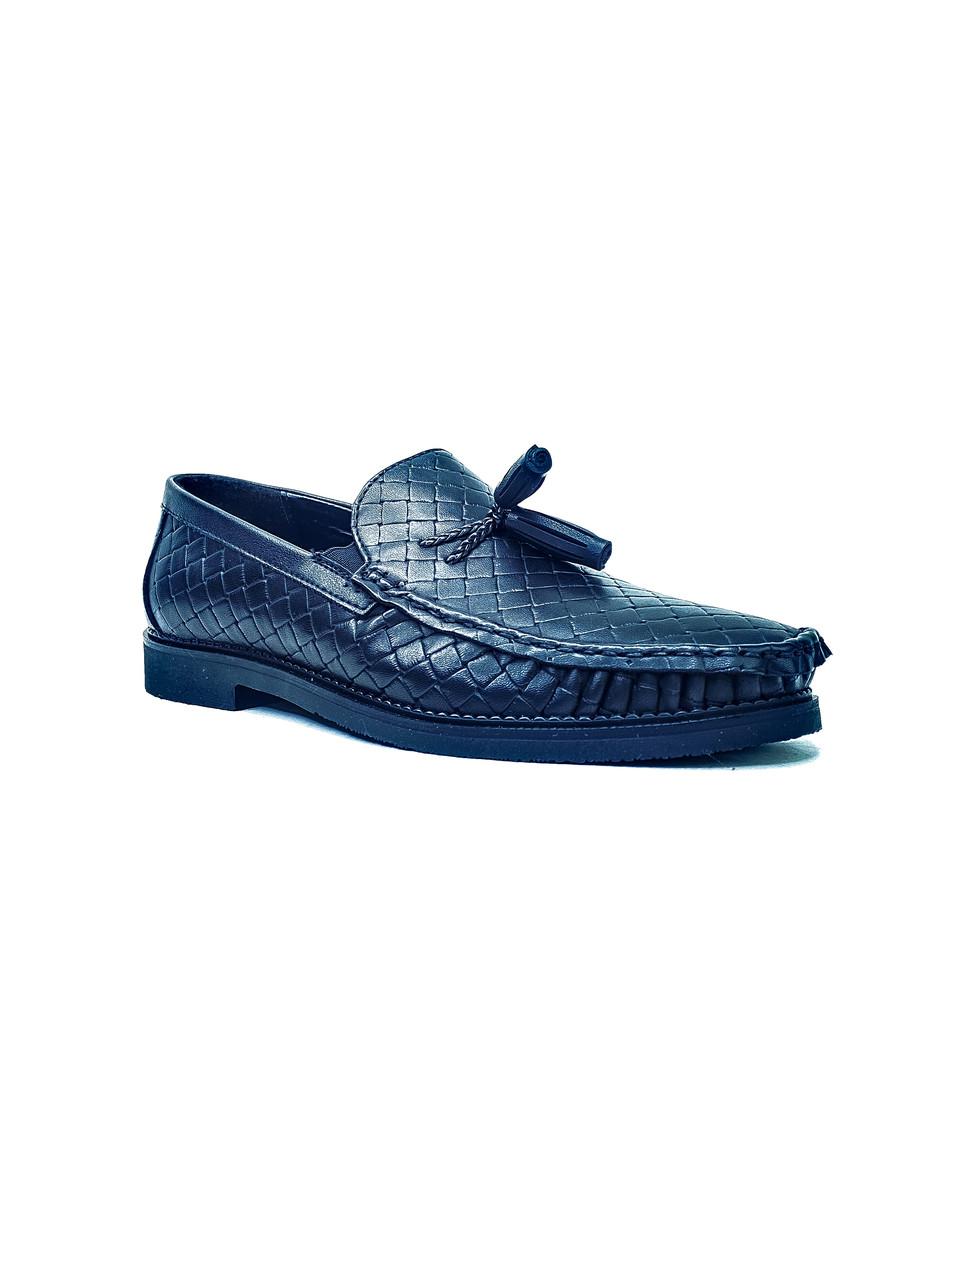 Мужские туфли - фото 4